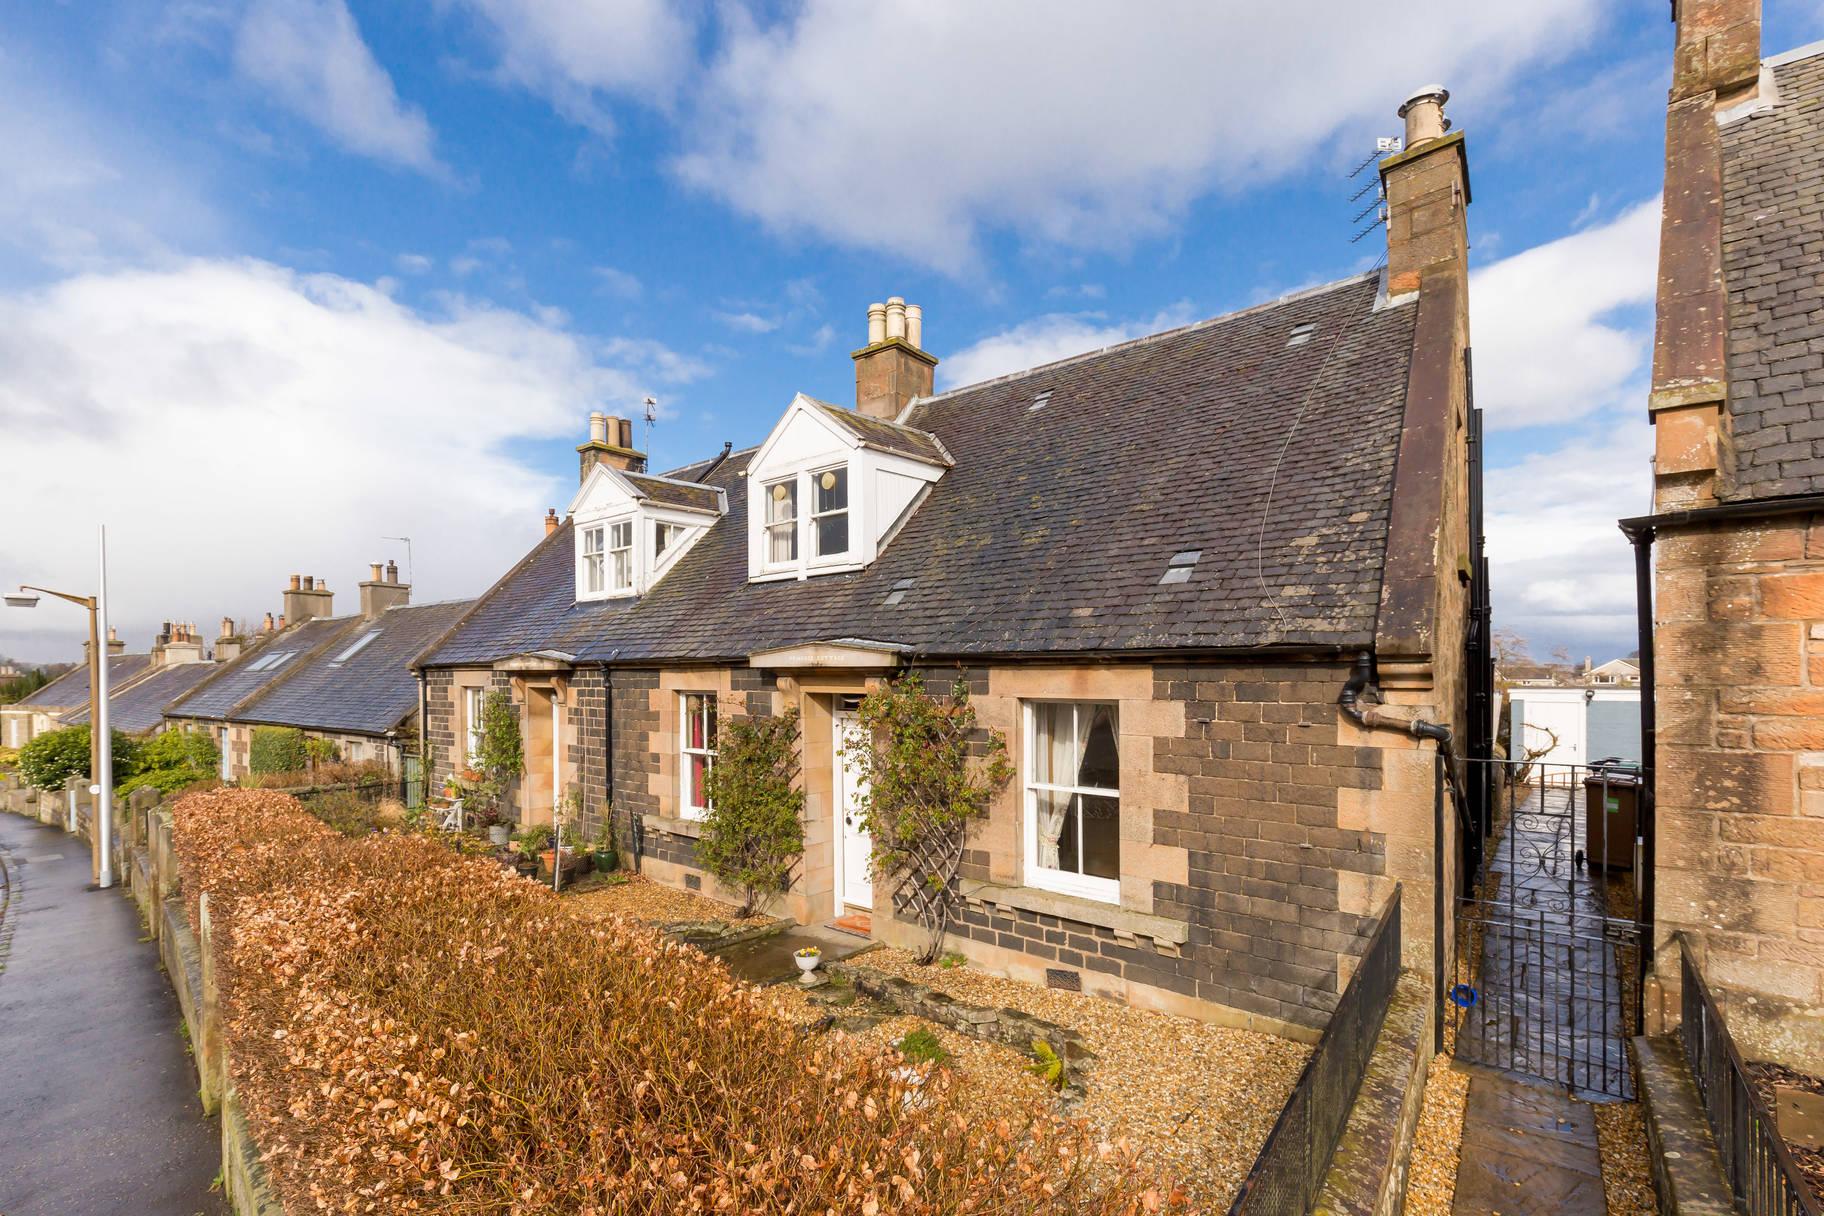 Primrose Cottage, 4 Baird Road, Ratho, EH28 8RA